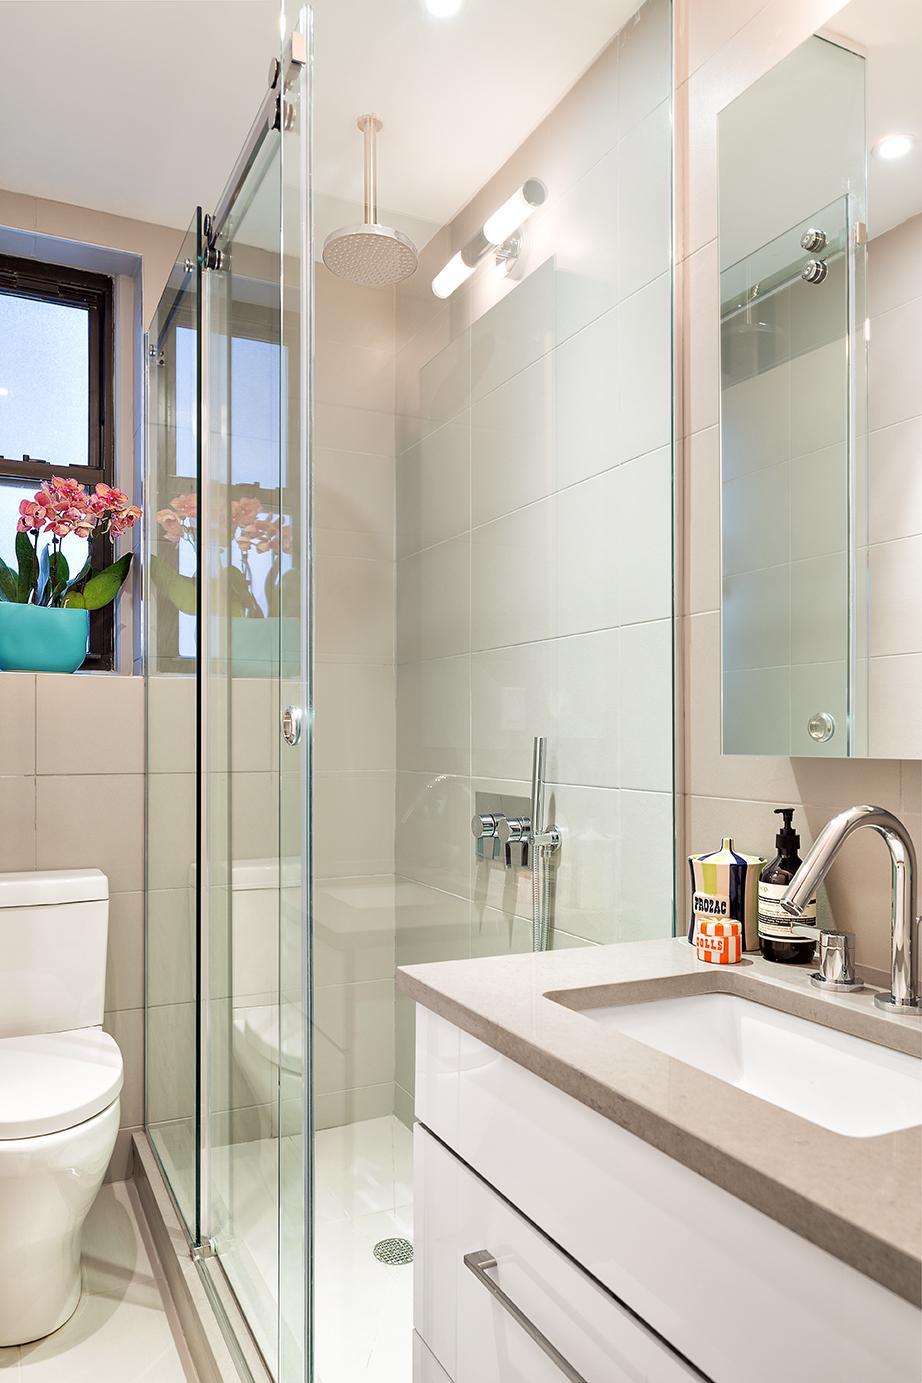 Rentals at The Arthur in Manhattan - Bathroom